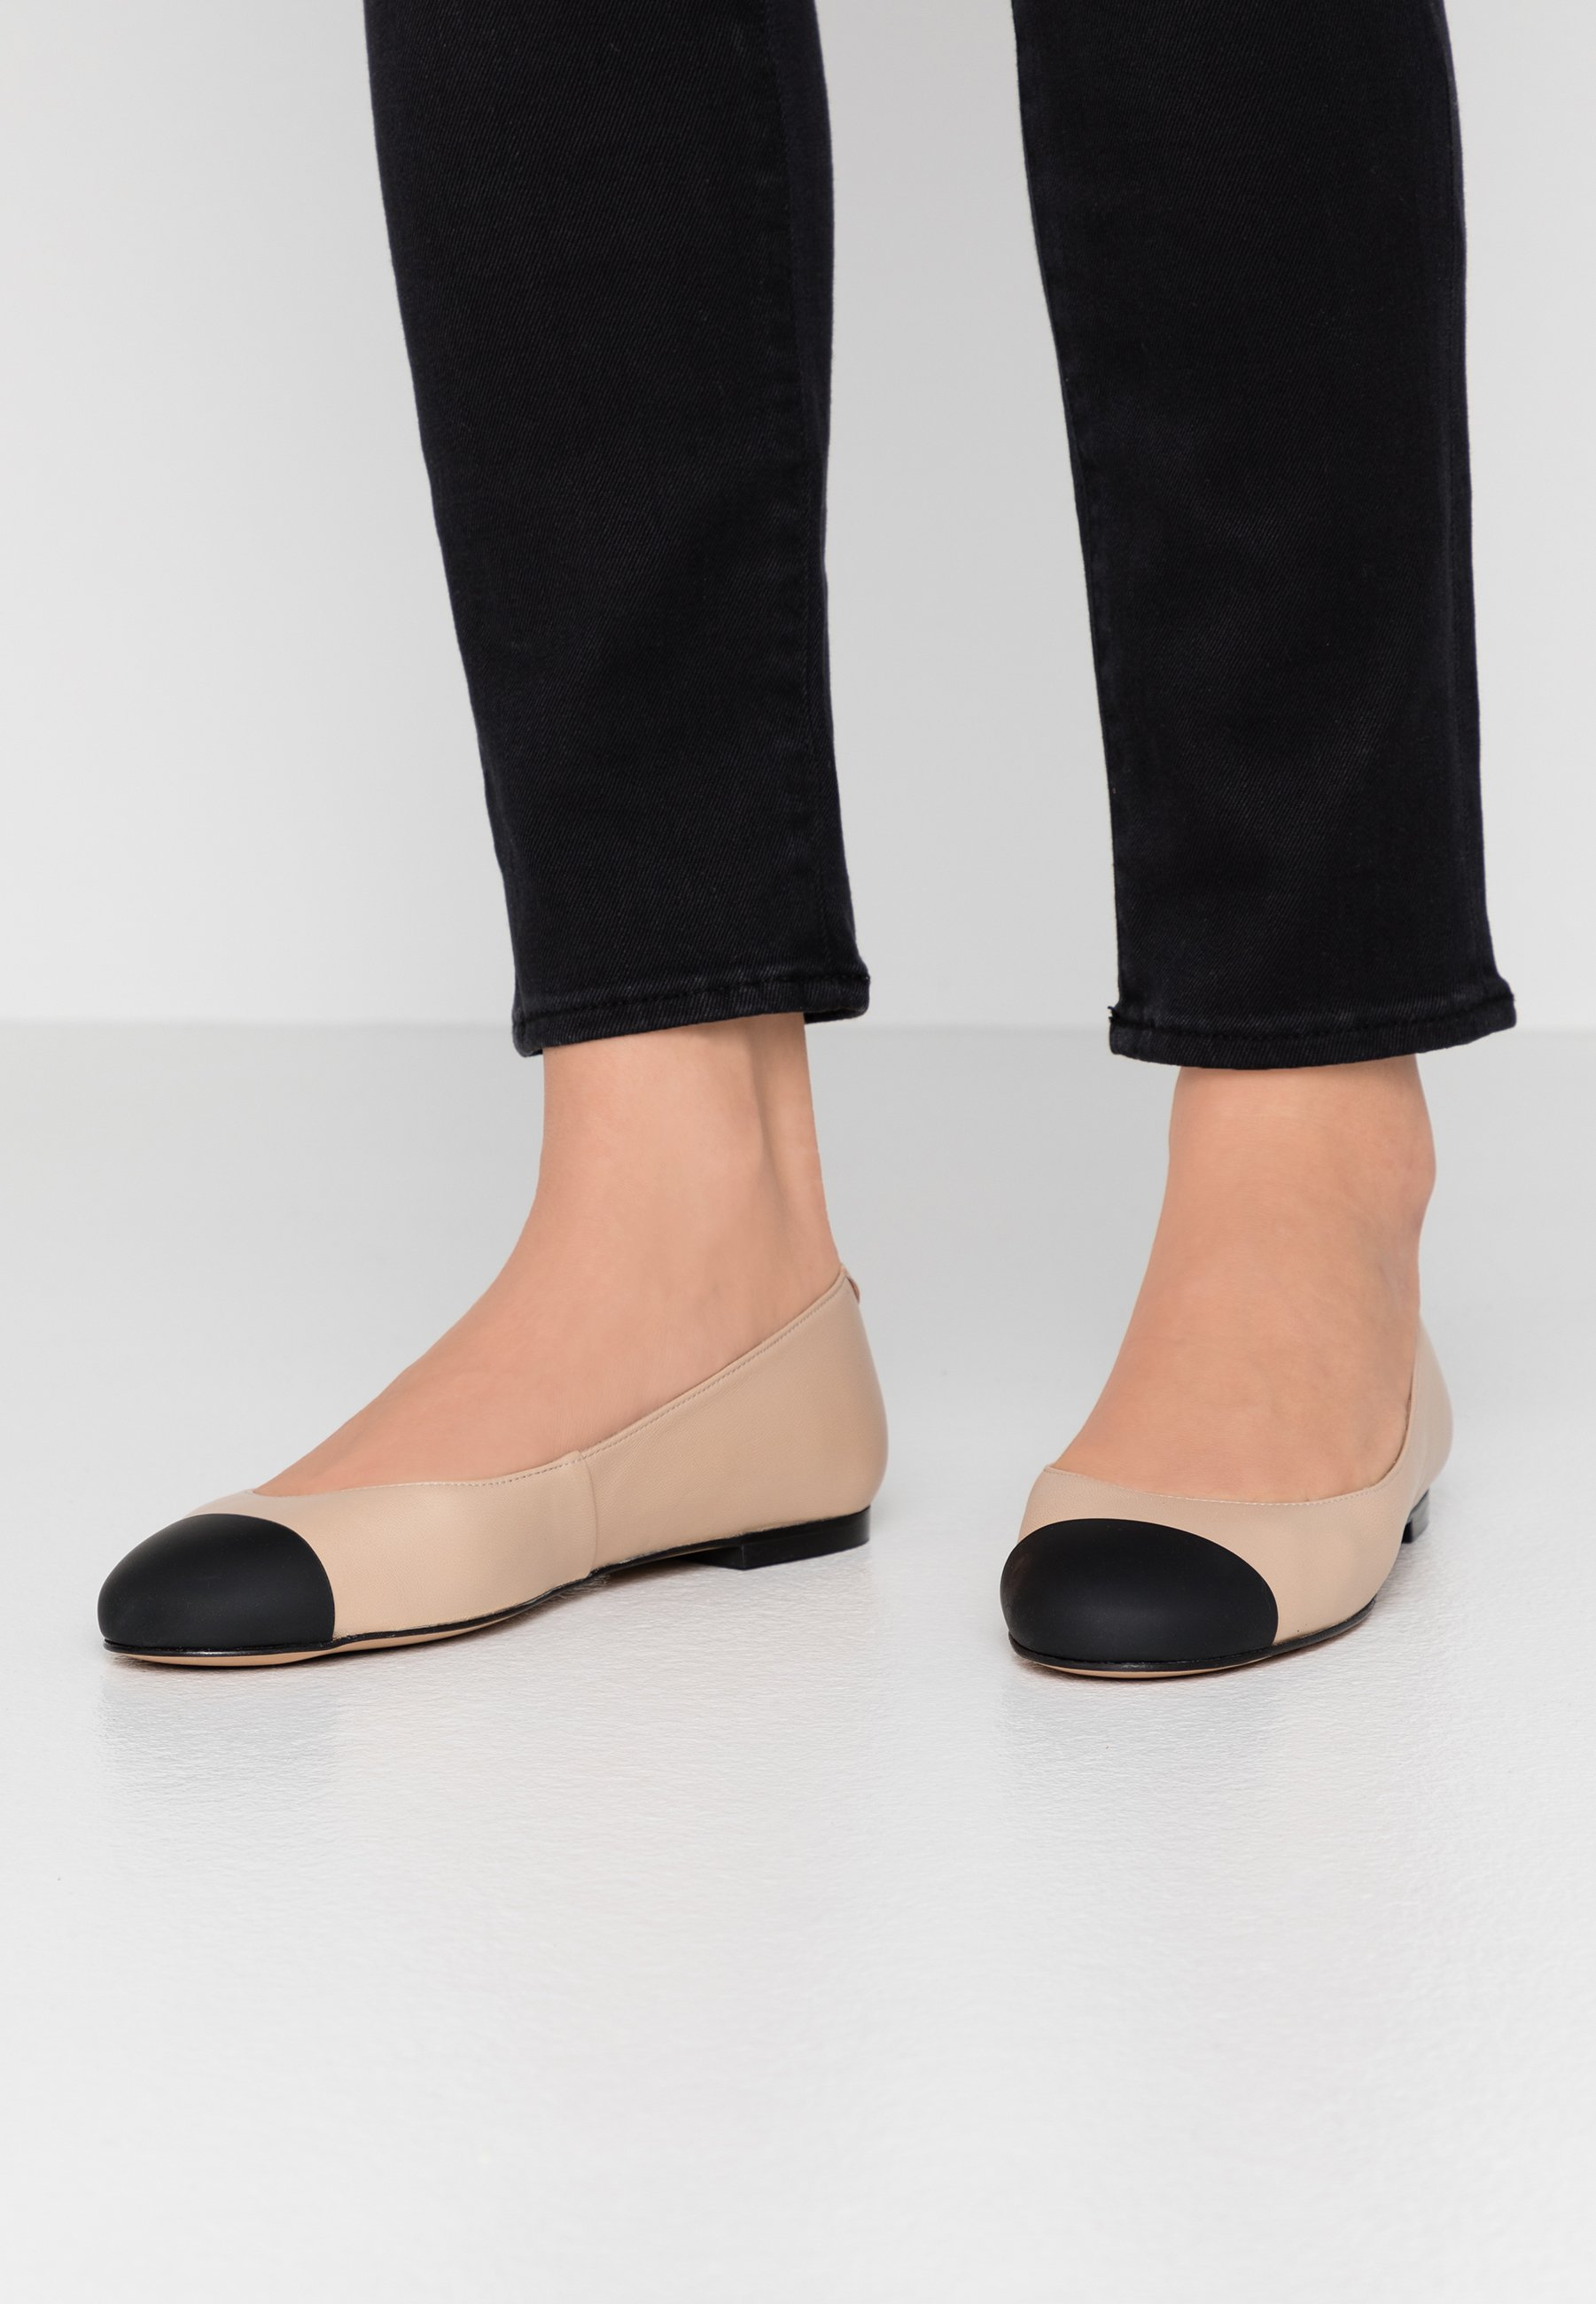 Best Seller Cheapest Toral Ballet pumps - creta | women's shoes 2020 3hGbI